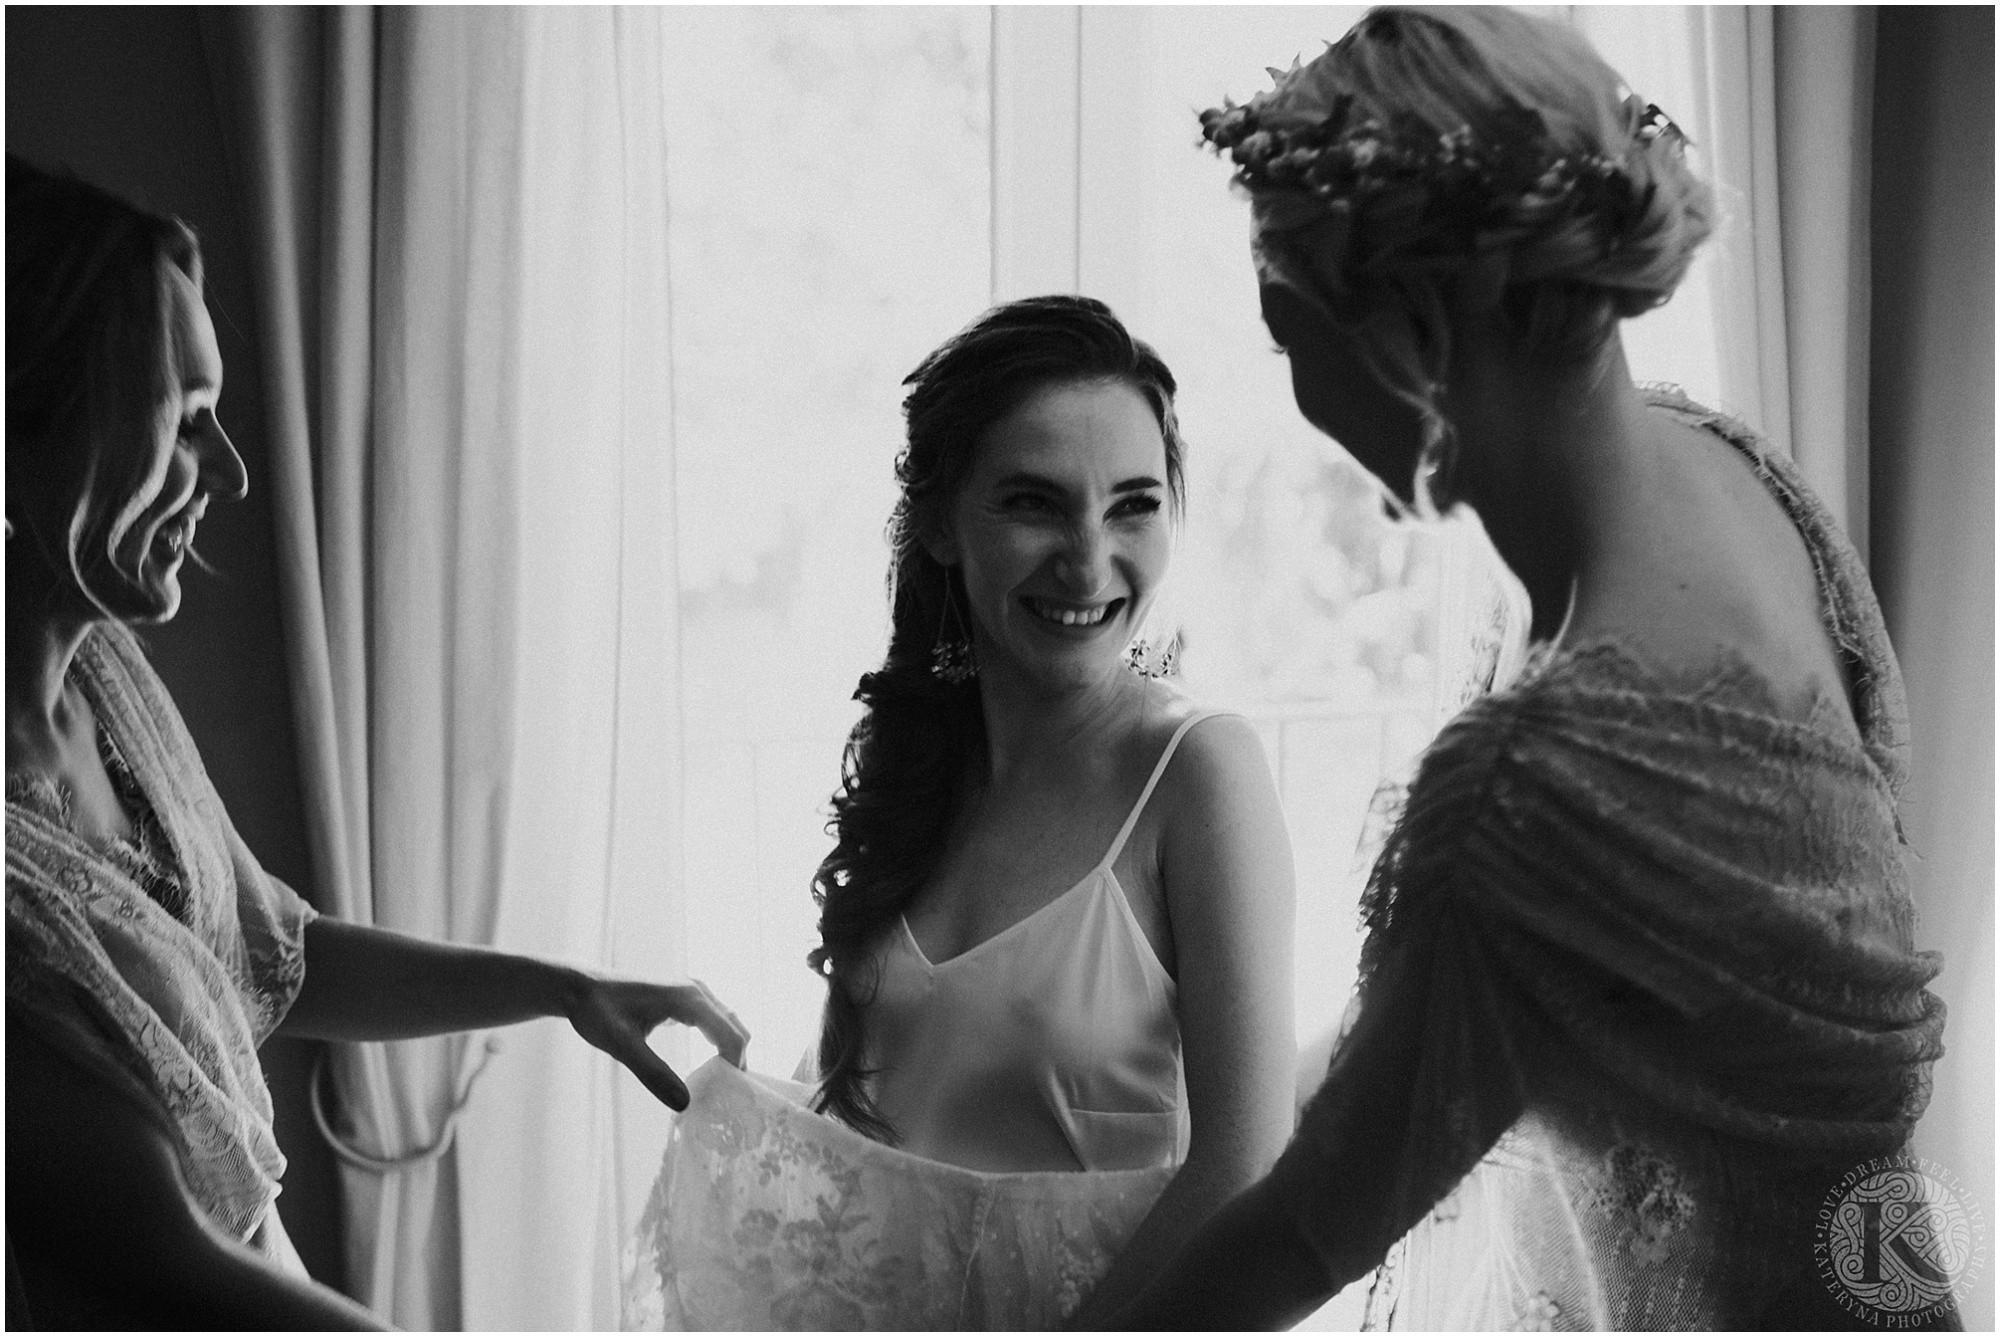 Kateryna-photos-photographe-mariage-vaucluse-provence-avignon-ferme-st-hugues_0018.jpg